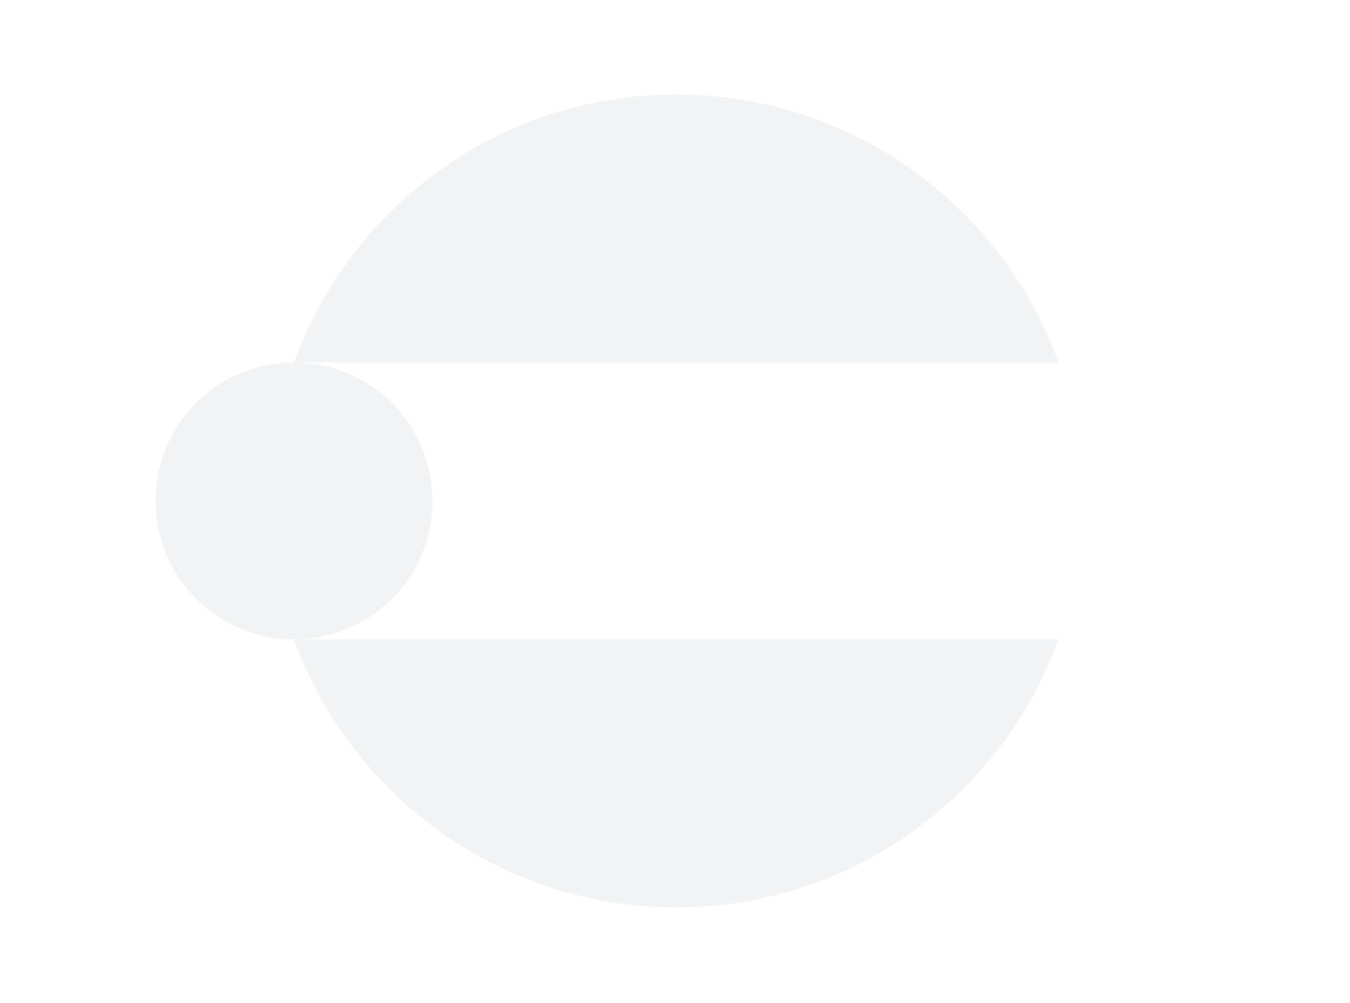 Make Noise Soundhack Erbe Verb 2019 White Knobs